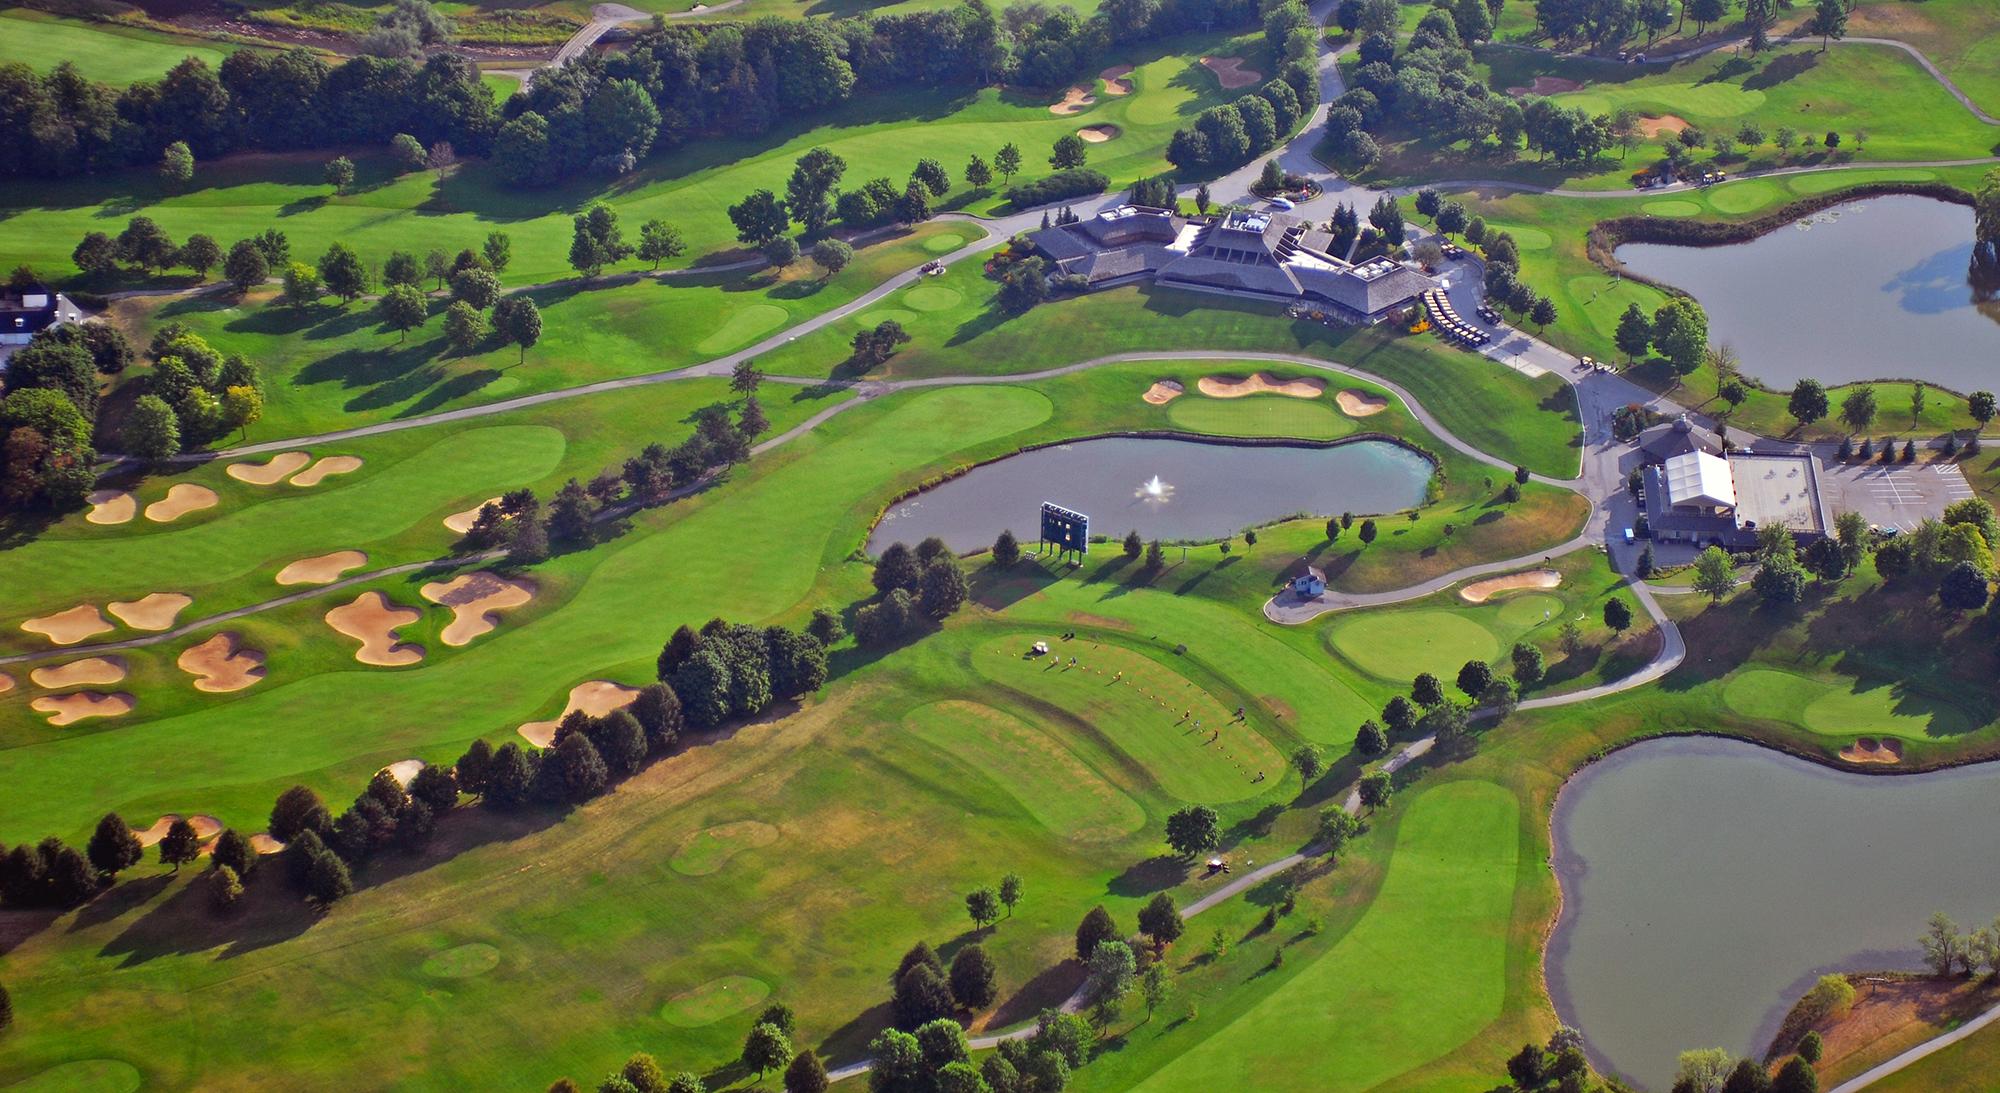 glen abbey golf club to host 2016 rbc canadian open